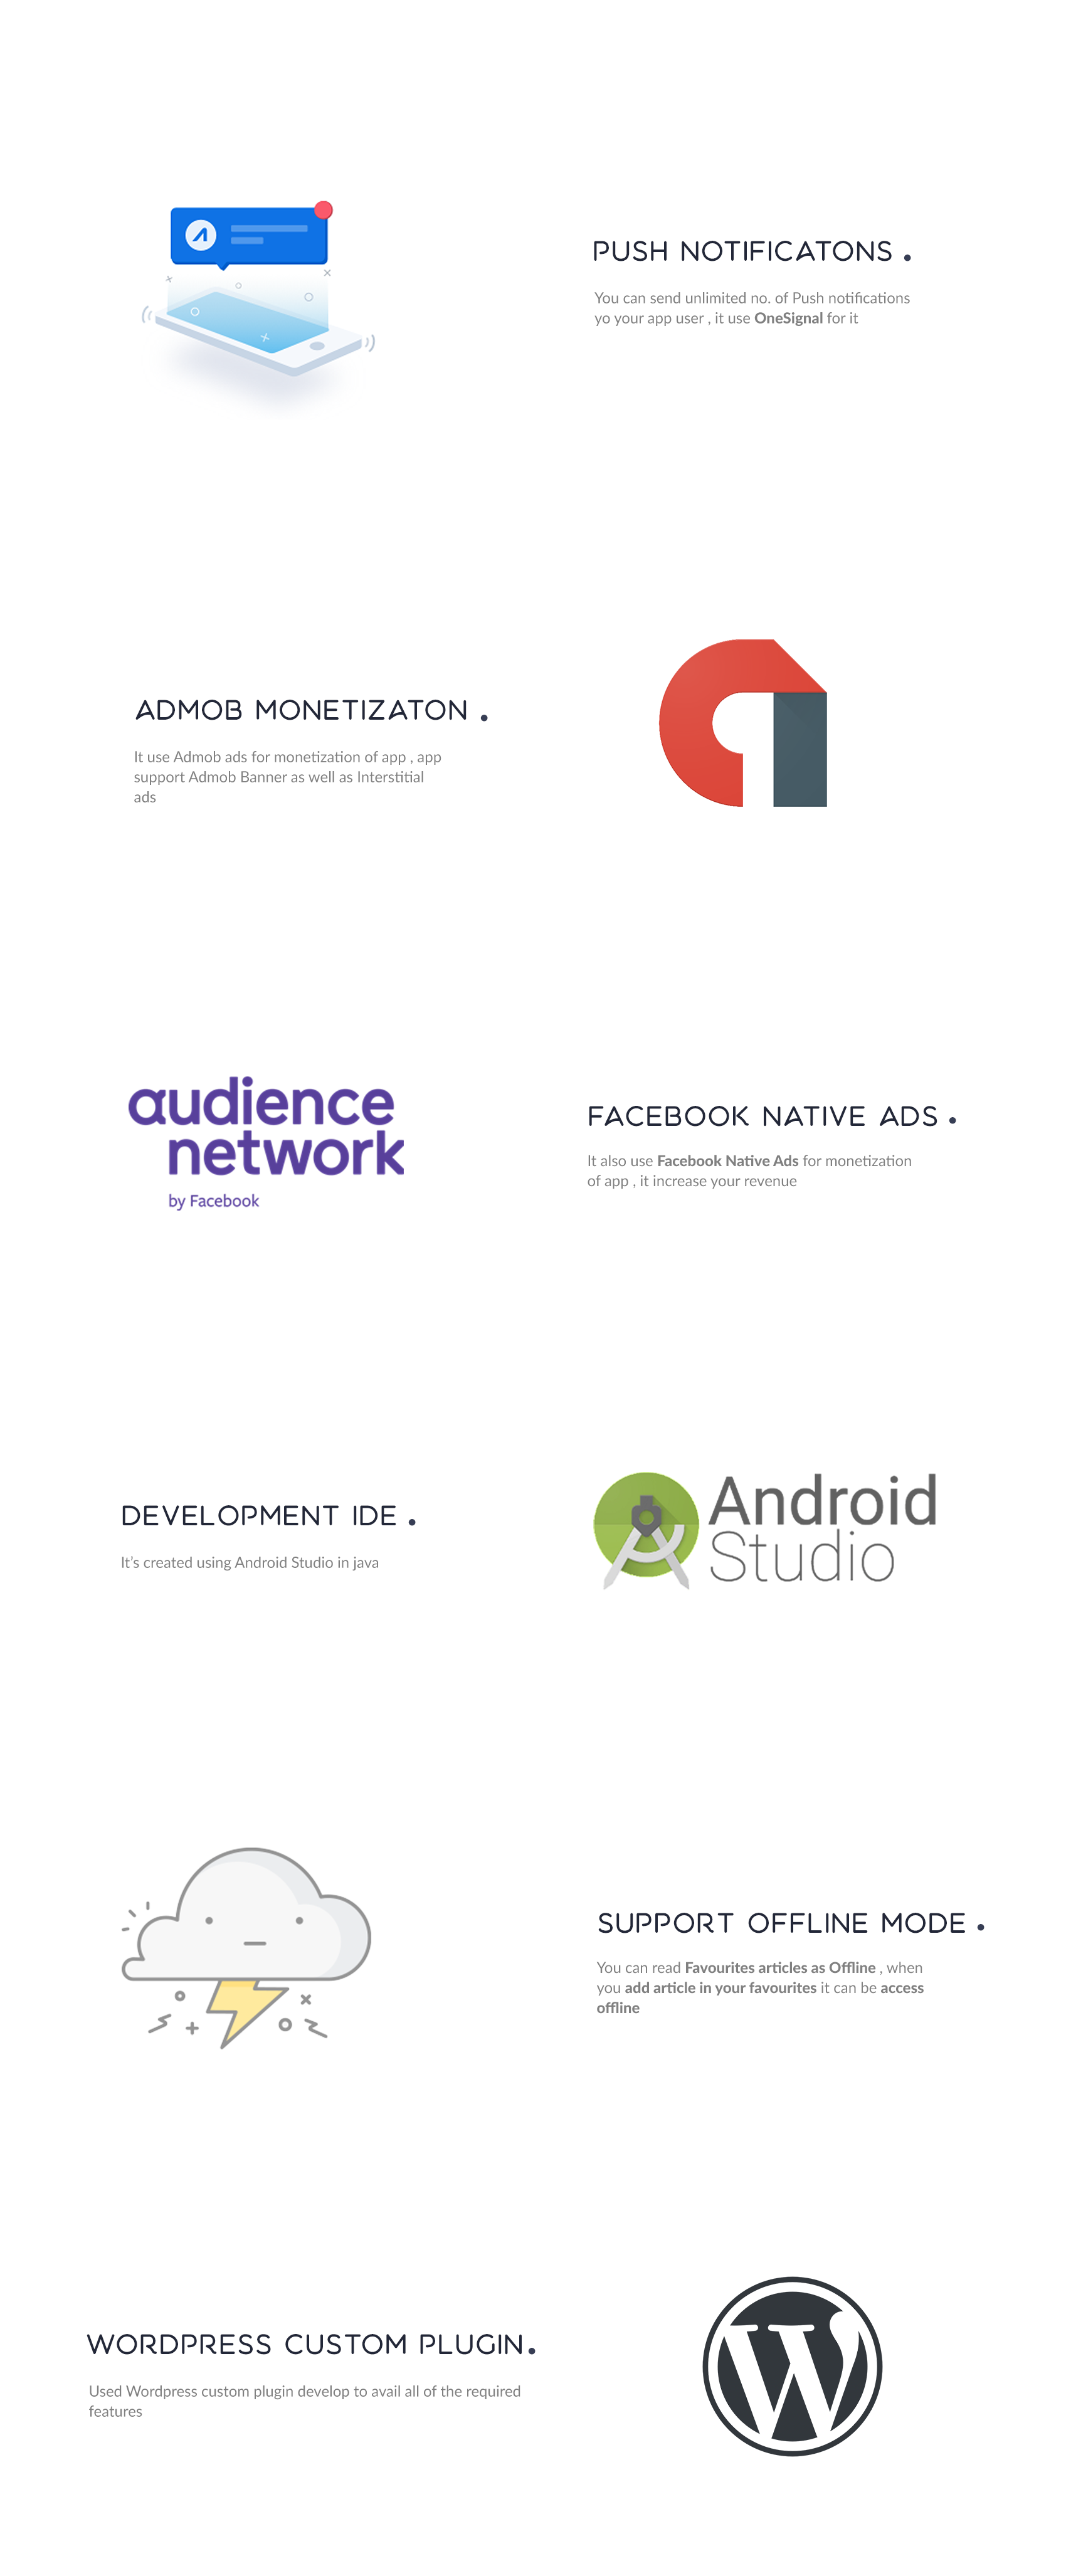 Newsy - Full Featured Native WordPress App - 5